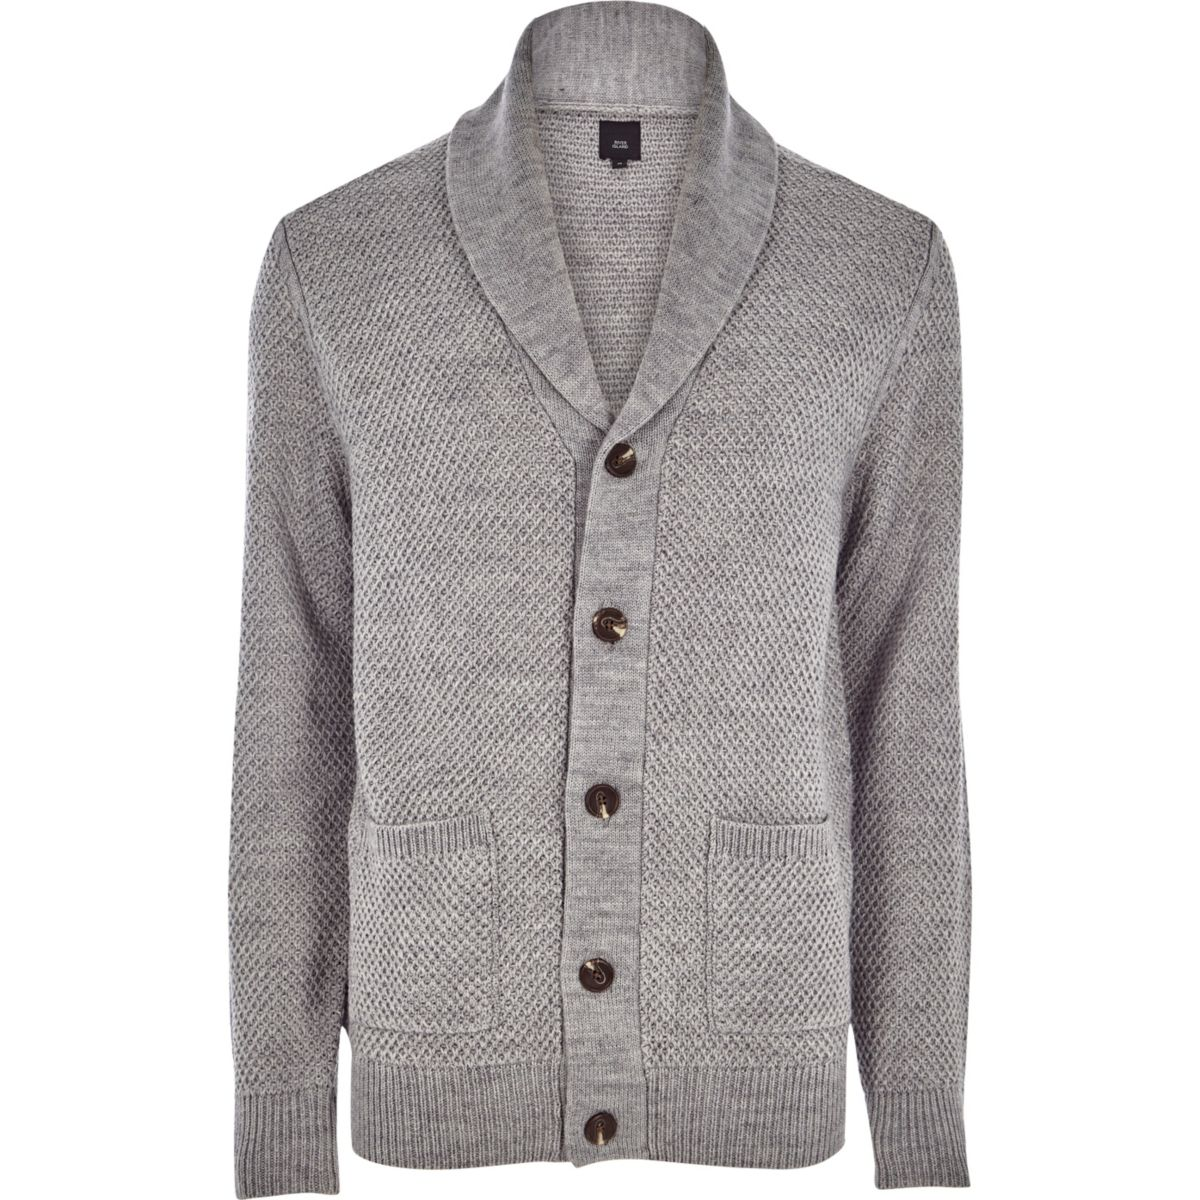 River Island Mens Cardigan With Zip Pockets And Shawl Collarg Black - Hoodies & Sweatshirts